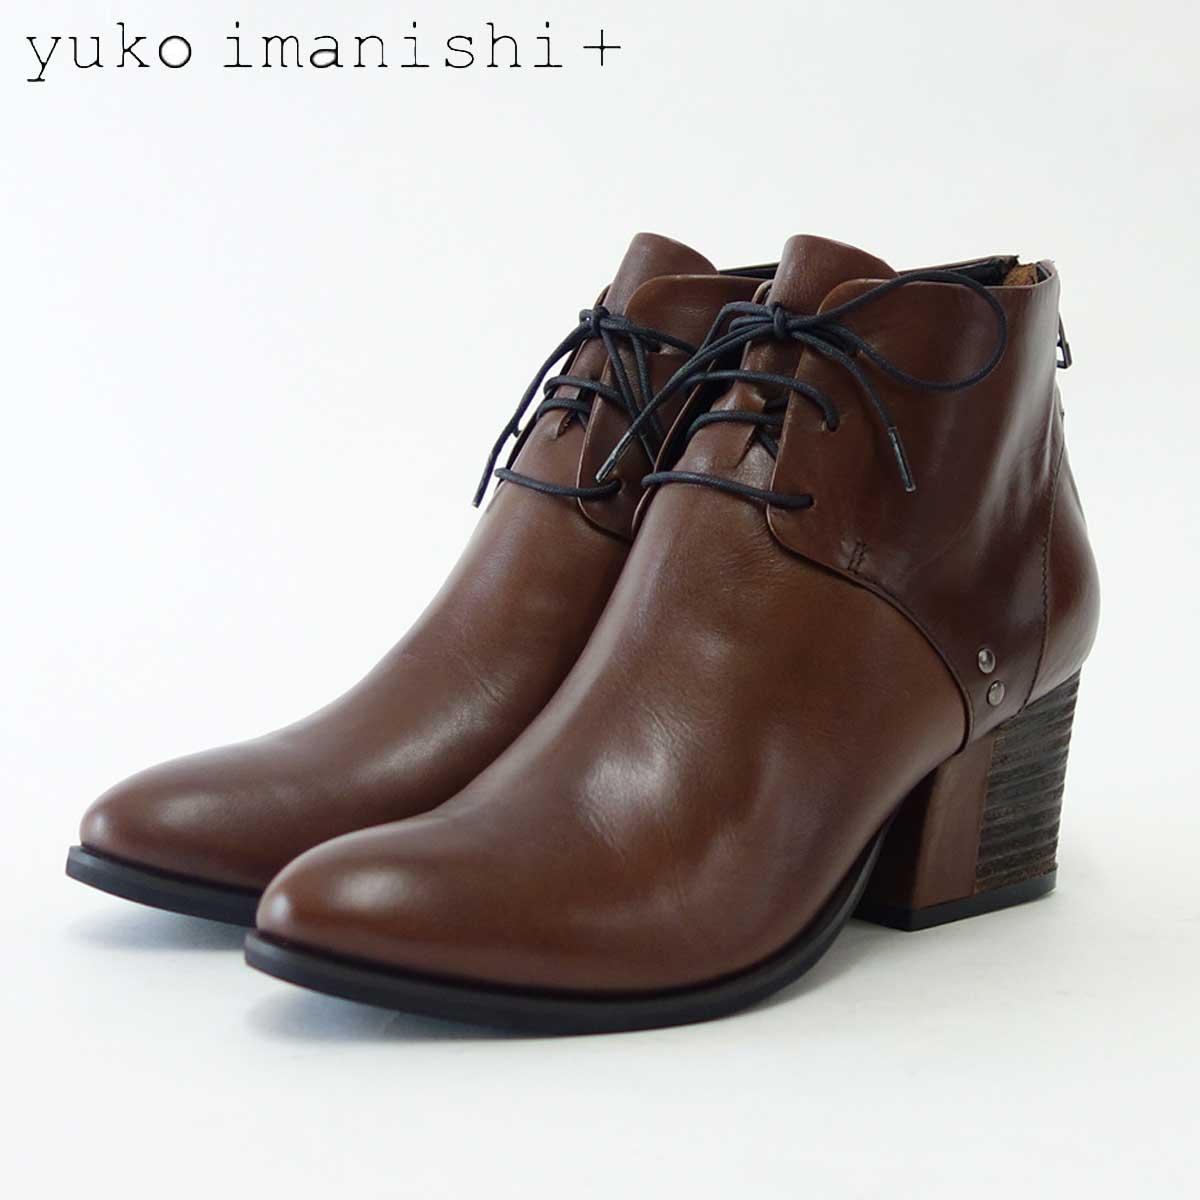 yuko imanishi + (ユーコイマニシ+) 77720 レッドブラウン 上質天然皮革のバックファスナーブーツ 「靴」